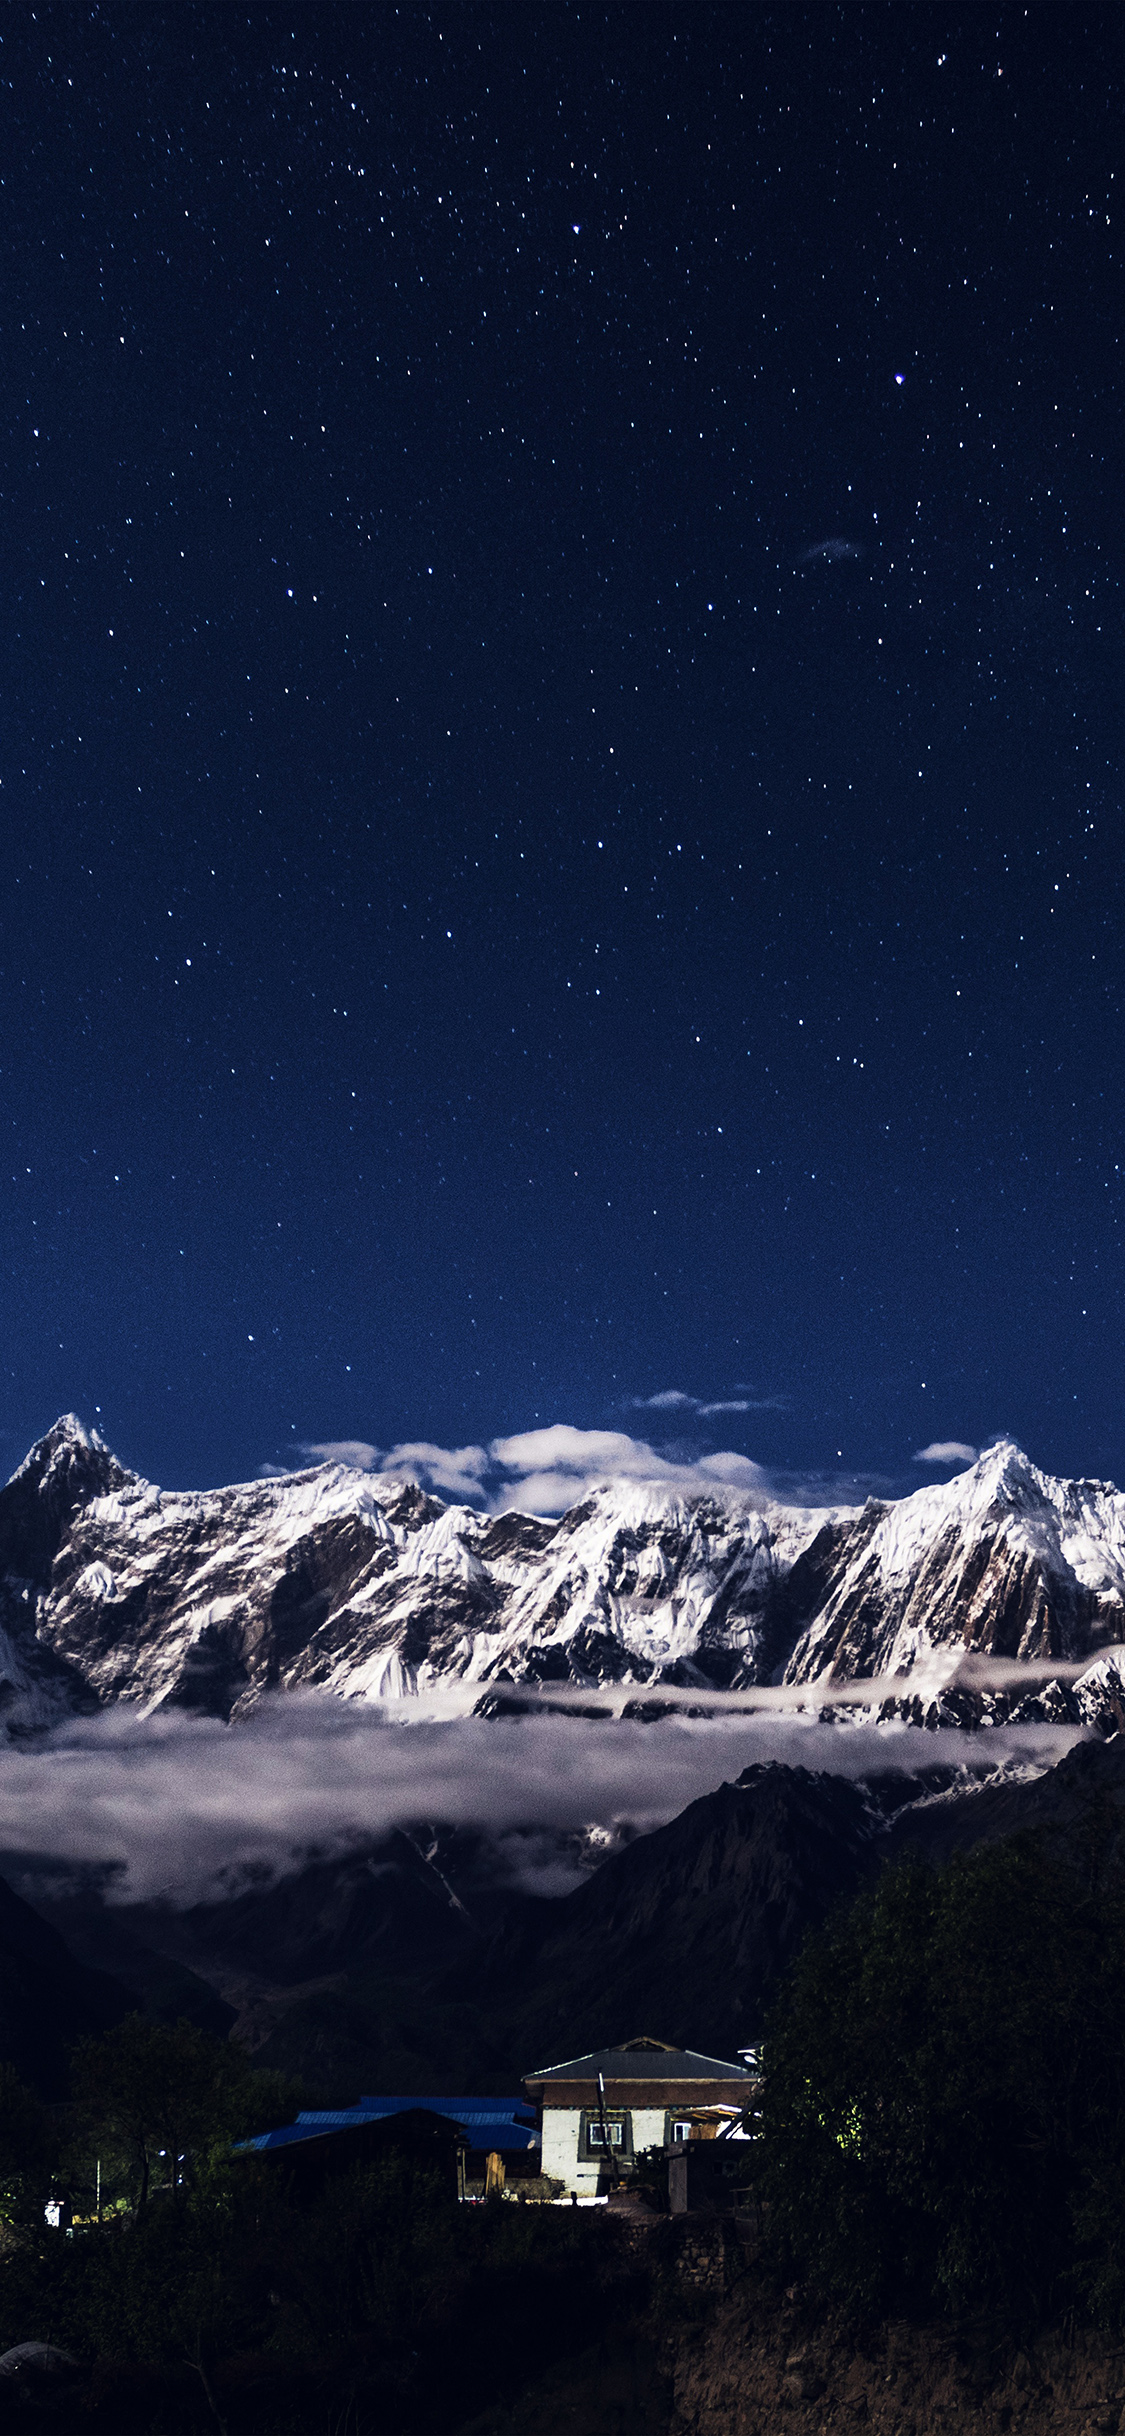 iPhonexpapers.com-Apple-iPhone-wallpaper-nk75-night-mountain-blue-sky-space-star-dark